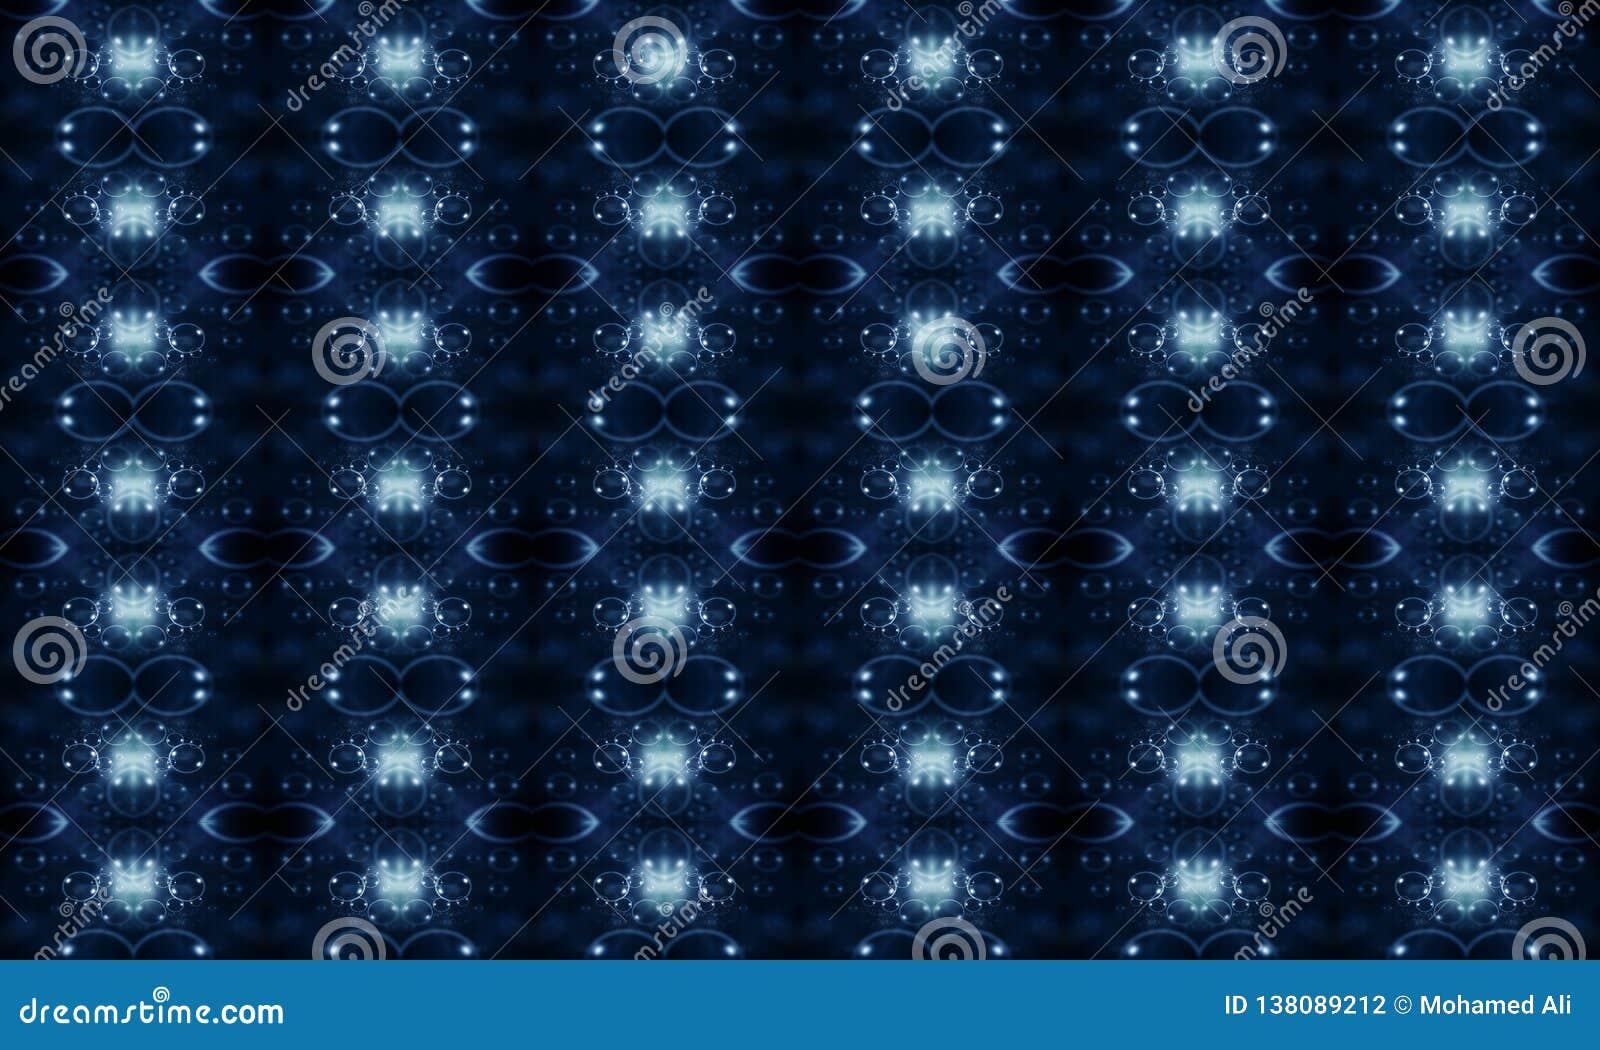 3d computer produceerde unieke multicolored moderne heldere energieke abstracte fractals patronenachtergrond